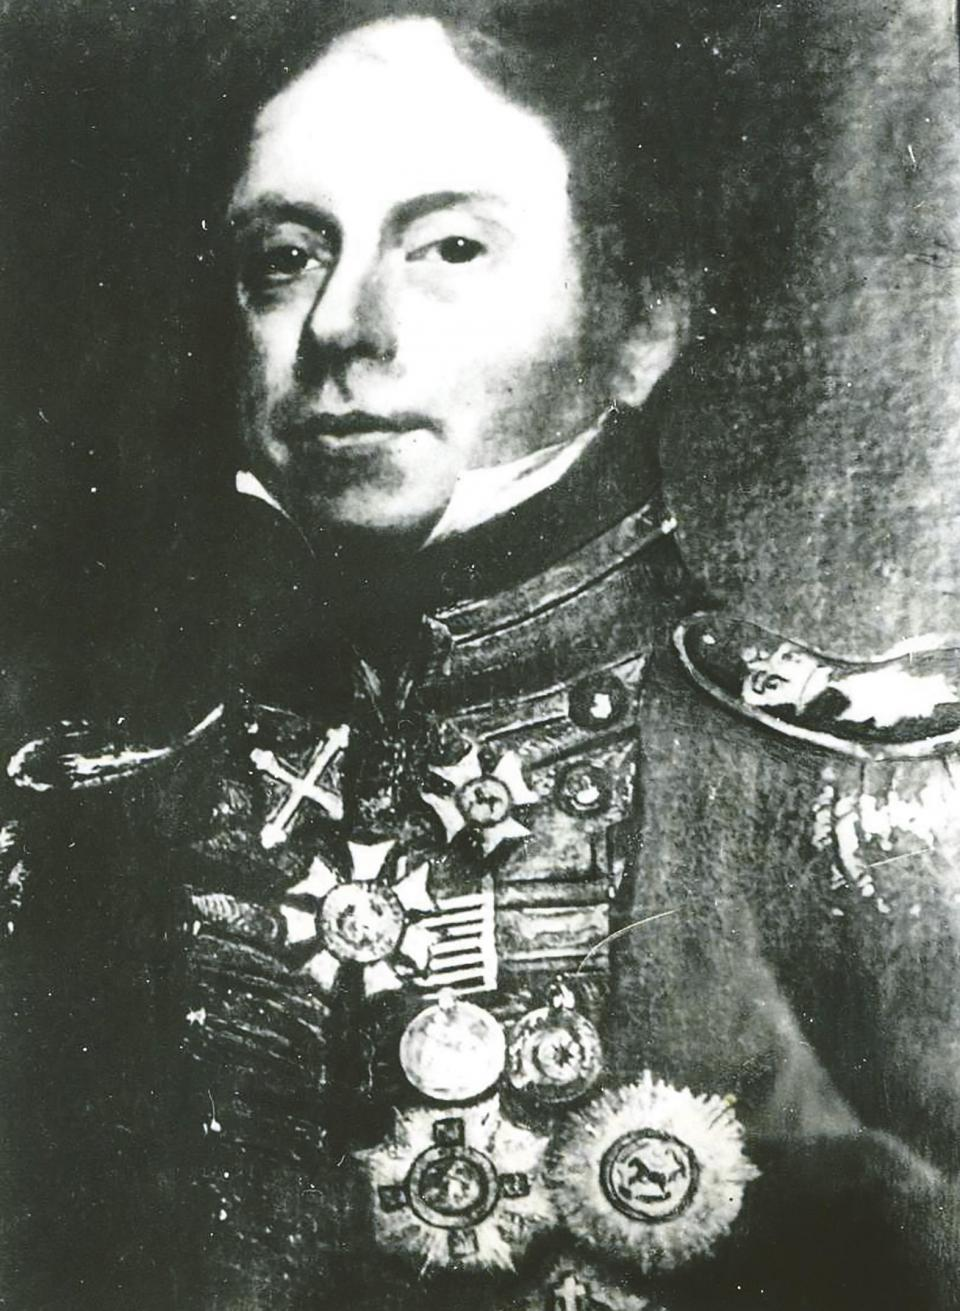 Francesco Rivalora